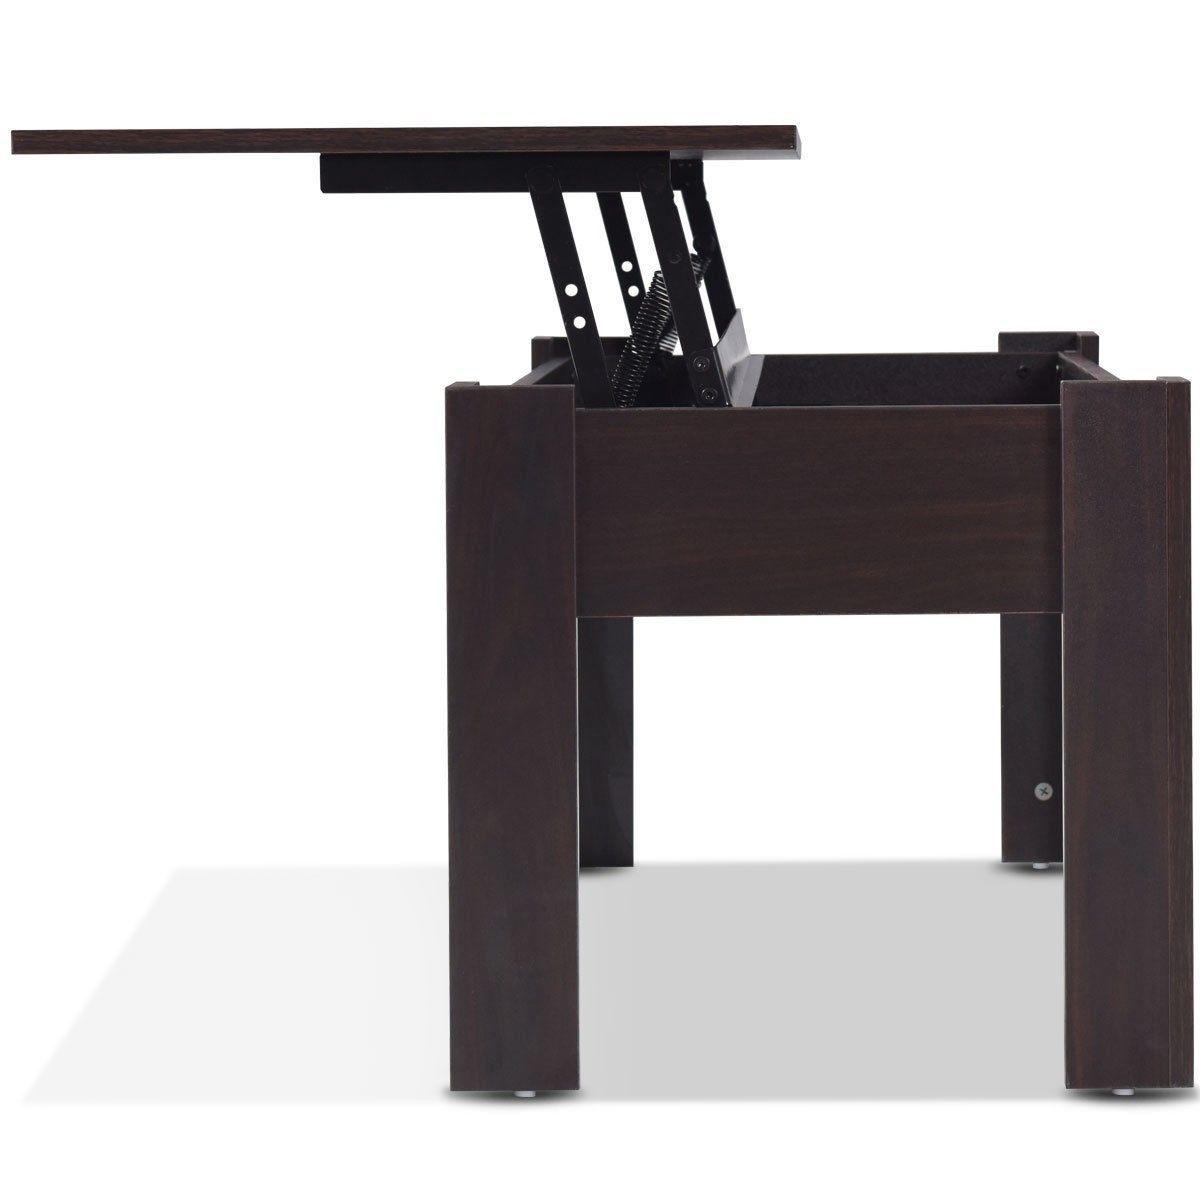 Miraculous unique ideas furniture design home furniture photography